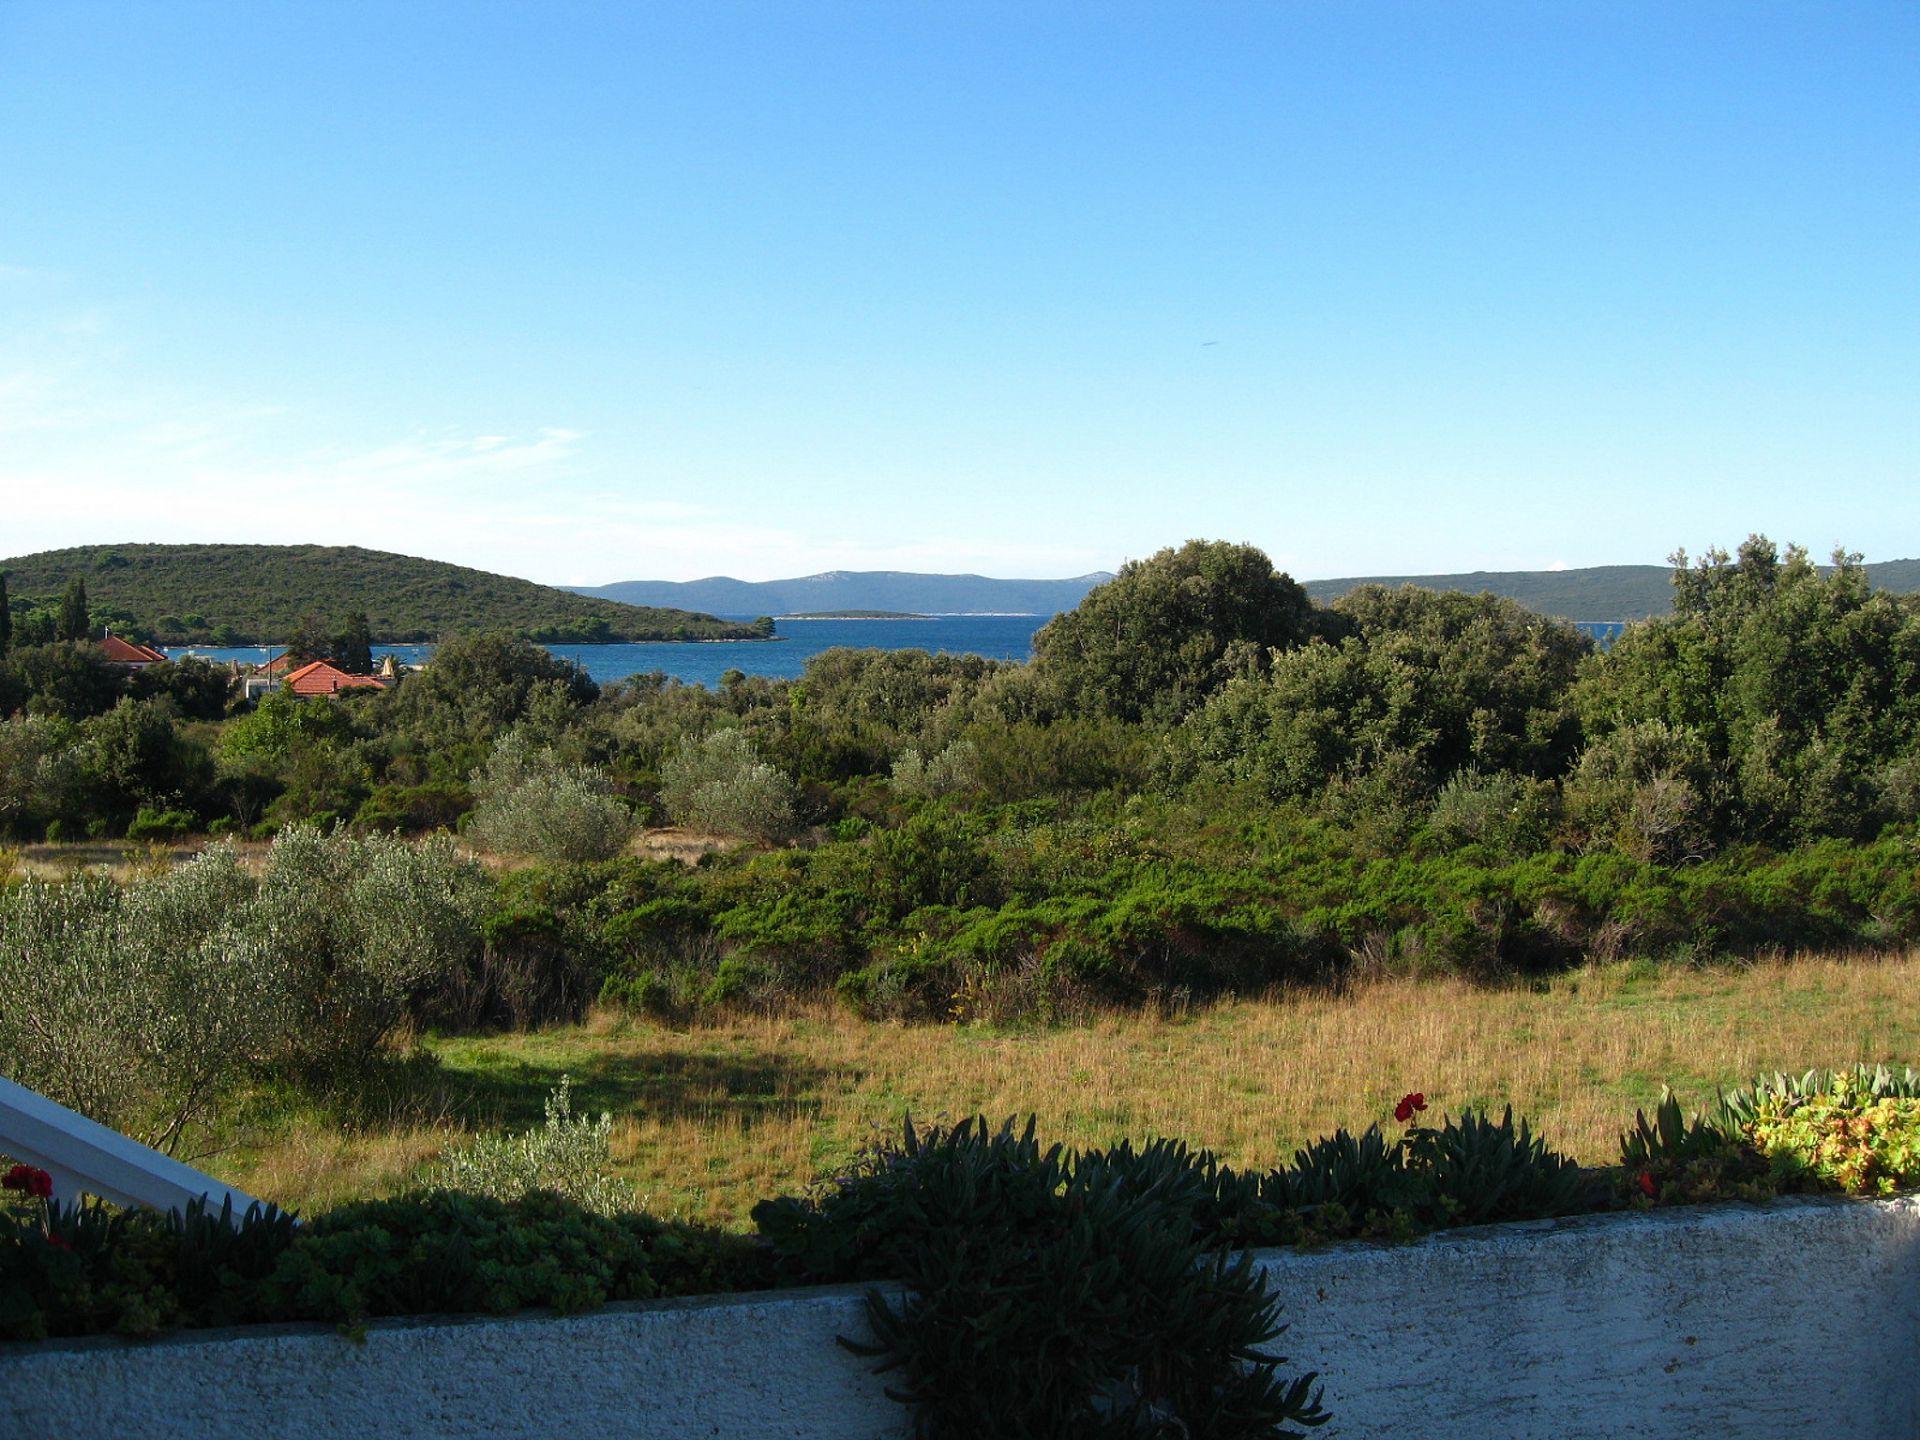 Ferienwohnung Lado SA1(2+1) - Muline (741846), Ugljan, Insel Ugljan, Dalmatien, Kroatien, Bild 8